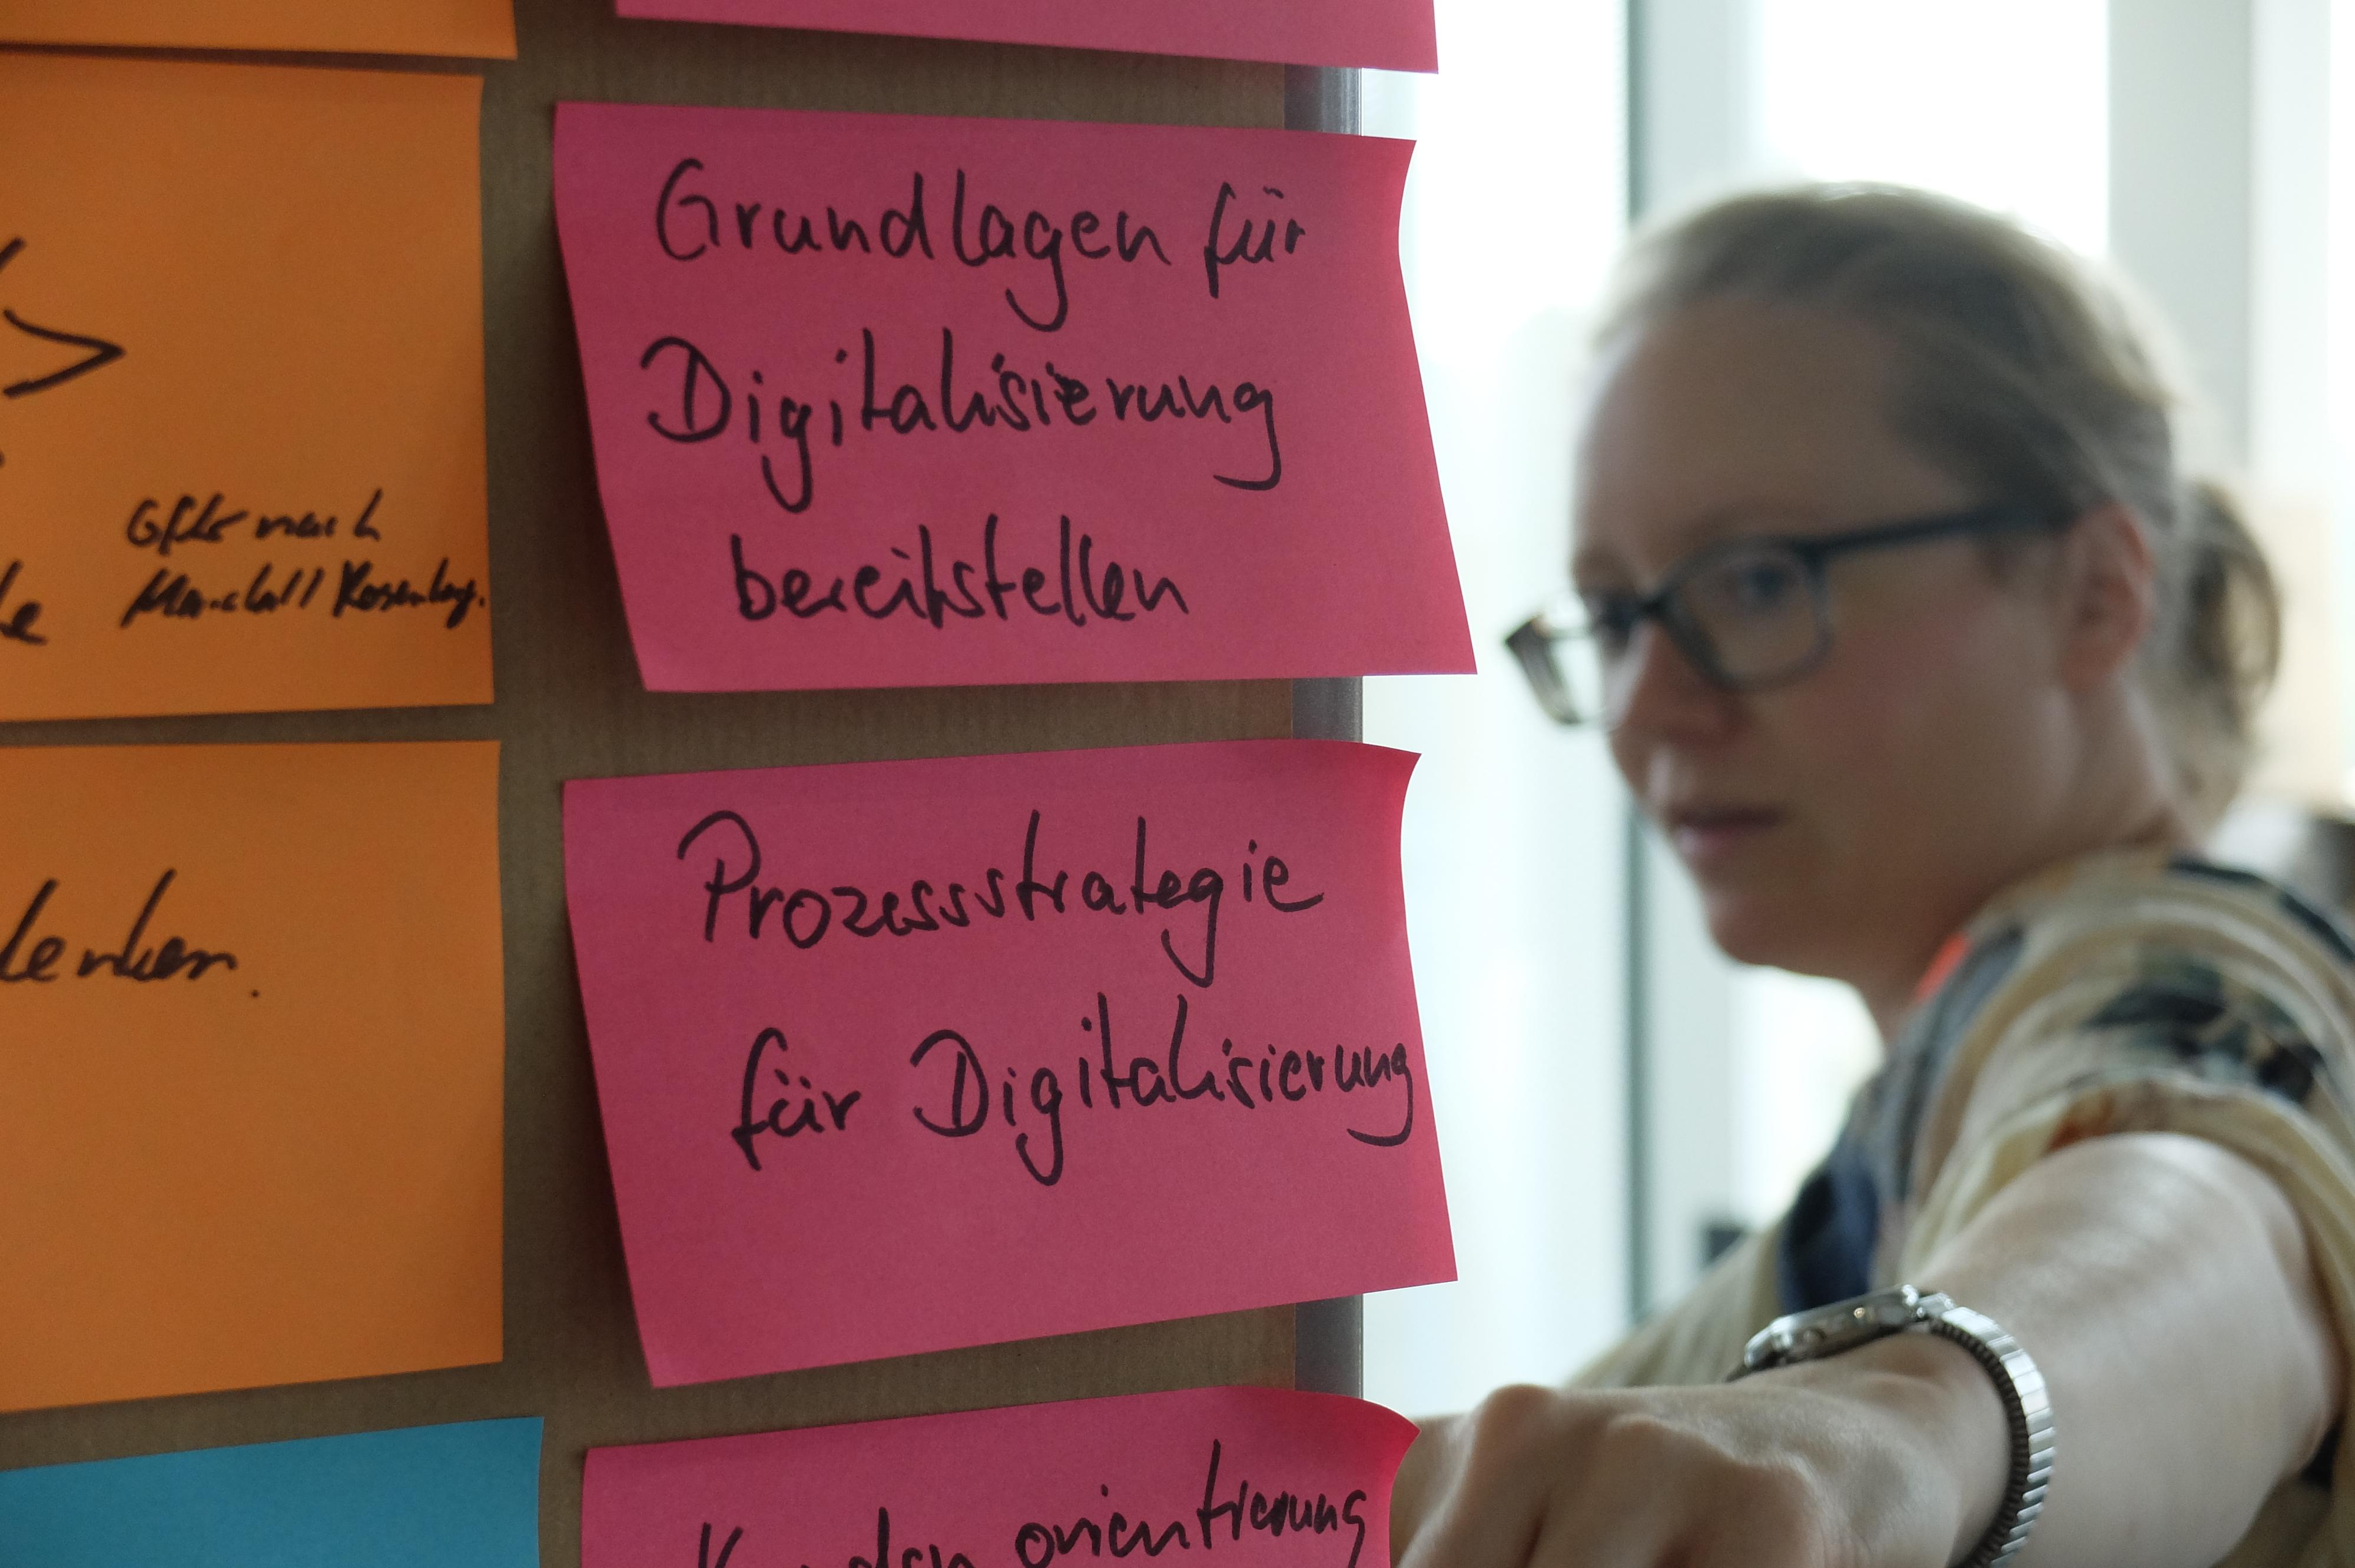 Disruptive Innovation, Digitalization